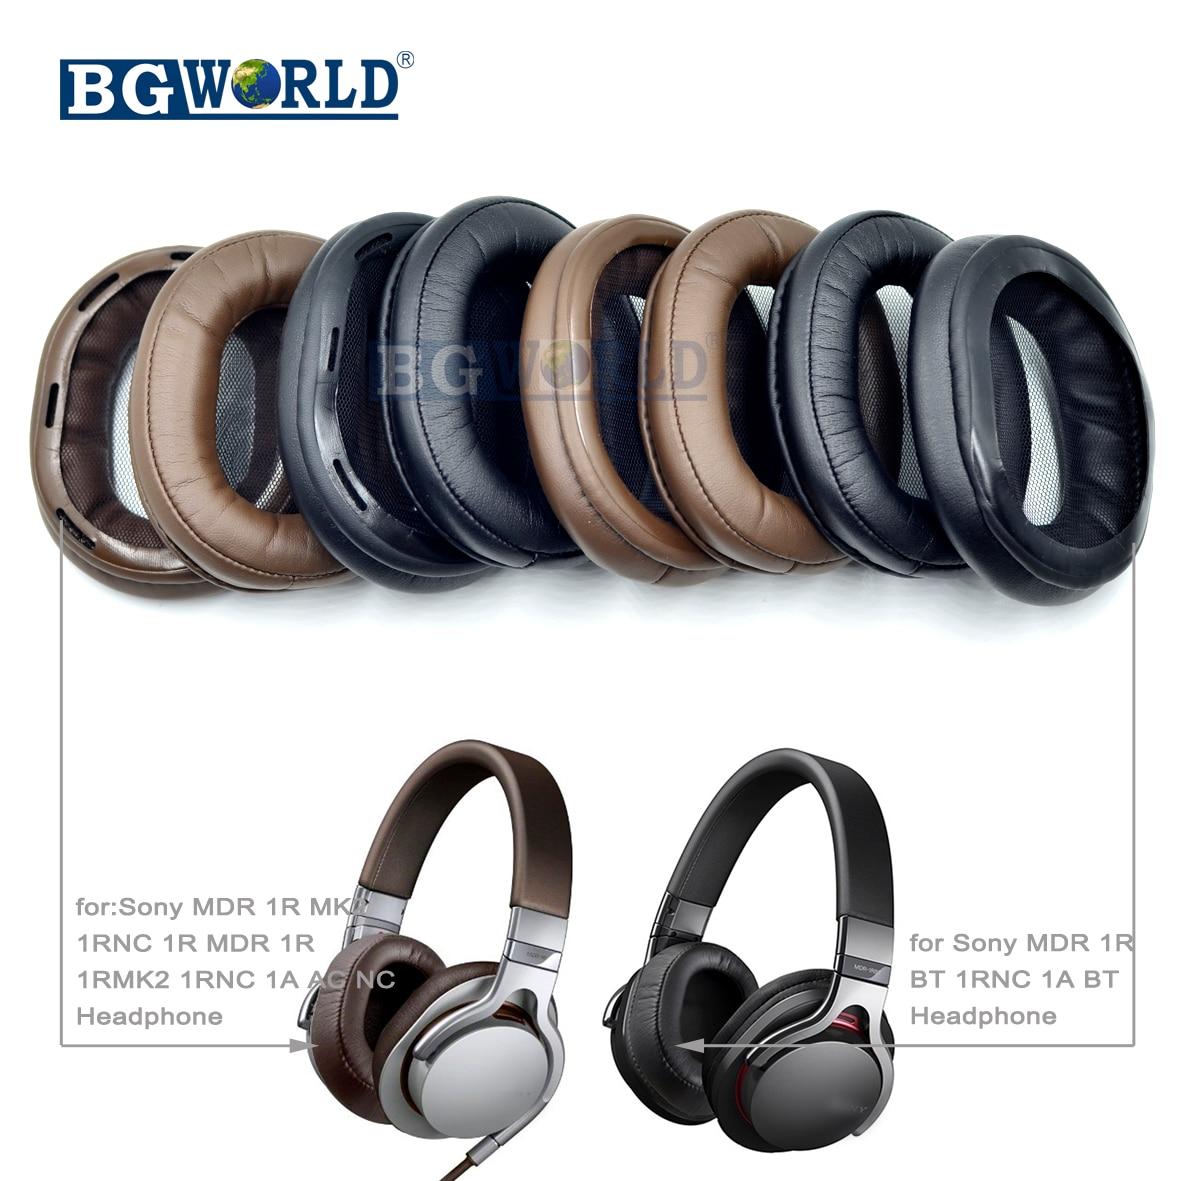 BGWORLD  Cushion Ear Pads Earpads Foam Covers For SONY MDR 1R 1R NC 1R MK2 1RBT MK2 1A 1ADAC 1ABT DAC BT Headphones Sponge